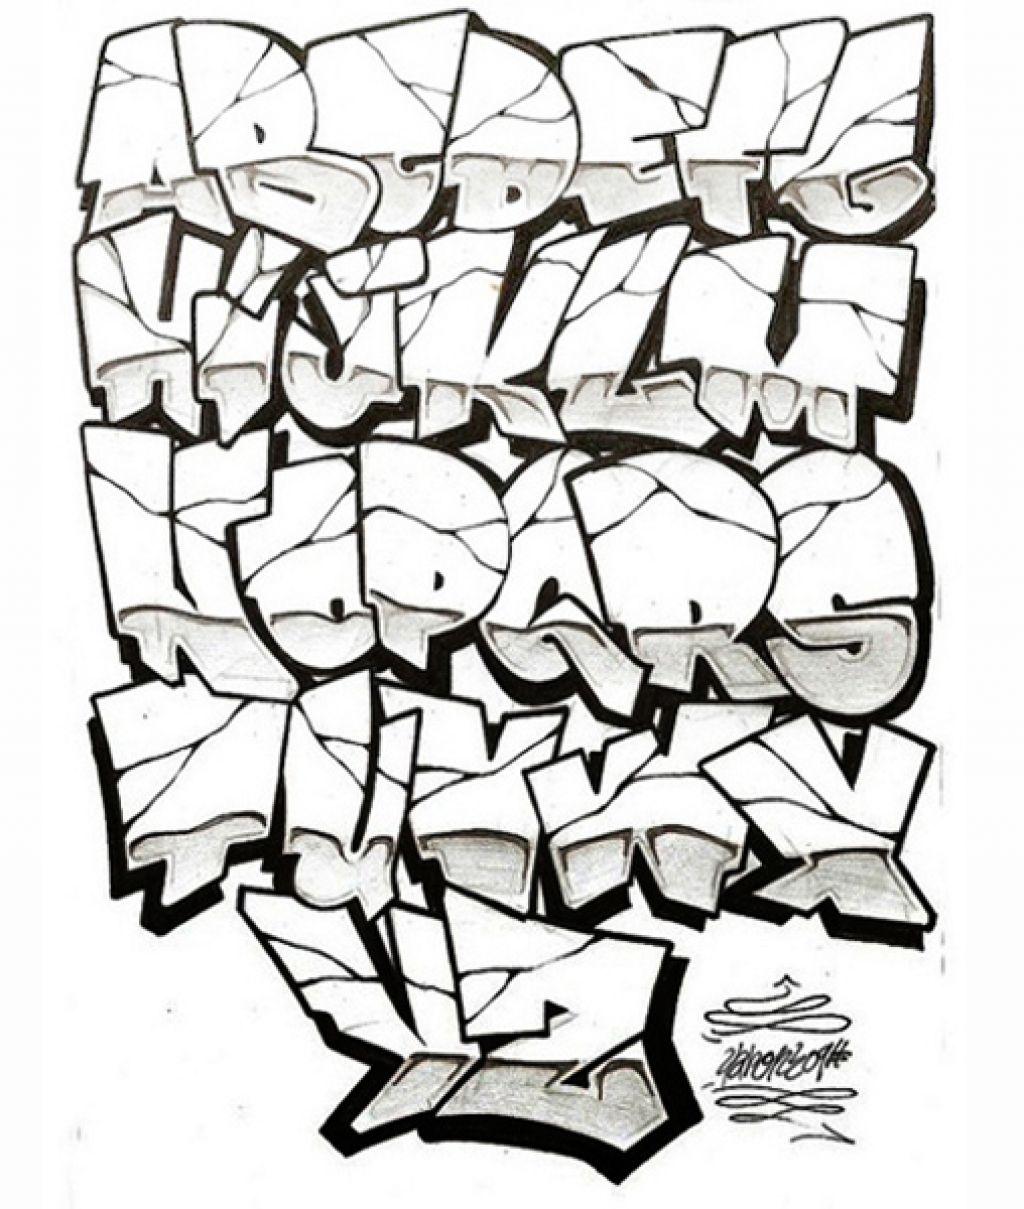 Cool Graffiti Styles and Ideas